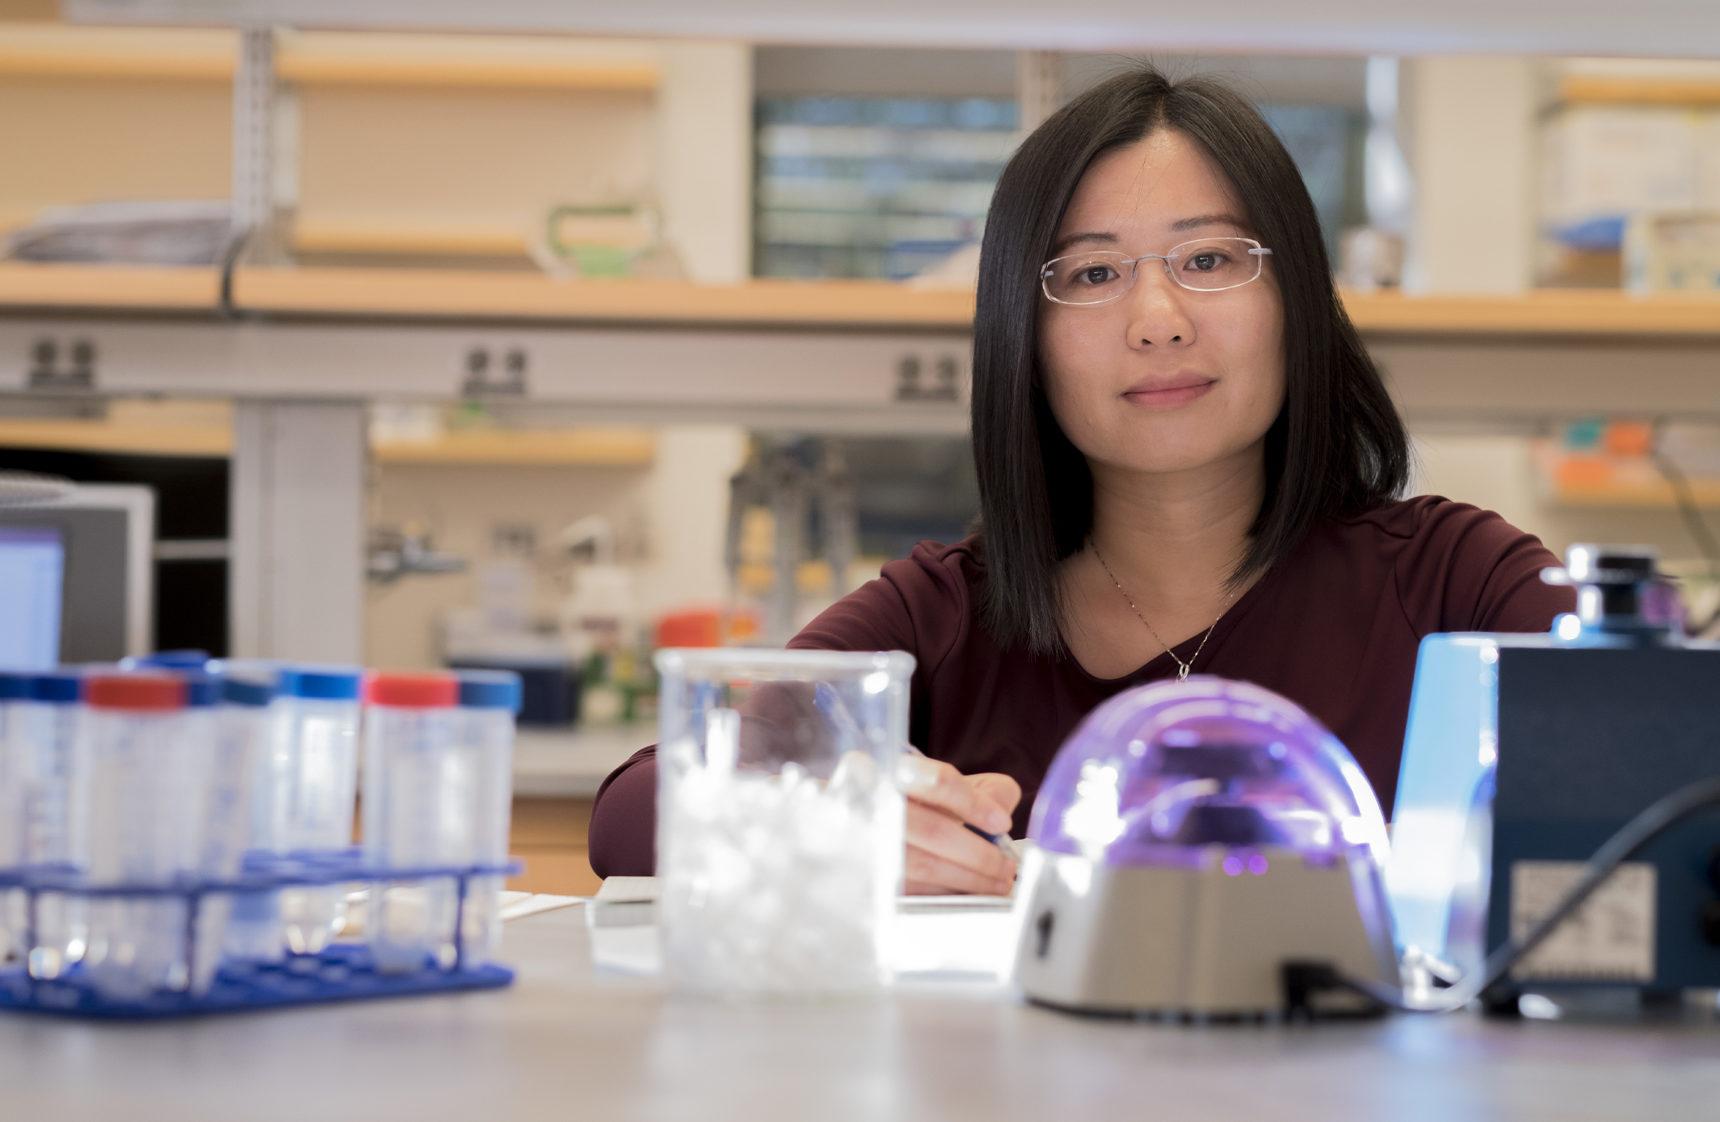 Portrait photo of Li Zhao, a geneticist at Rockefeller University.